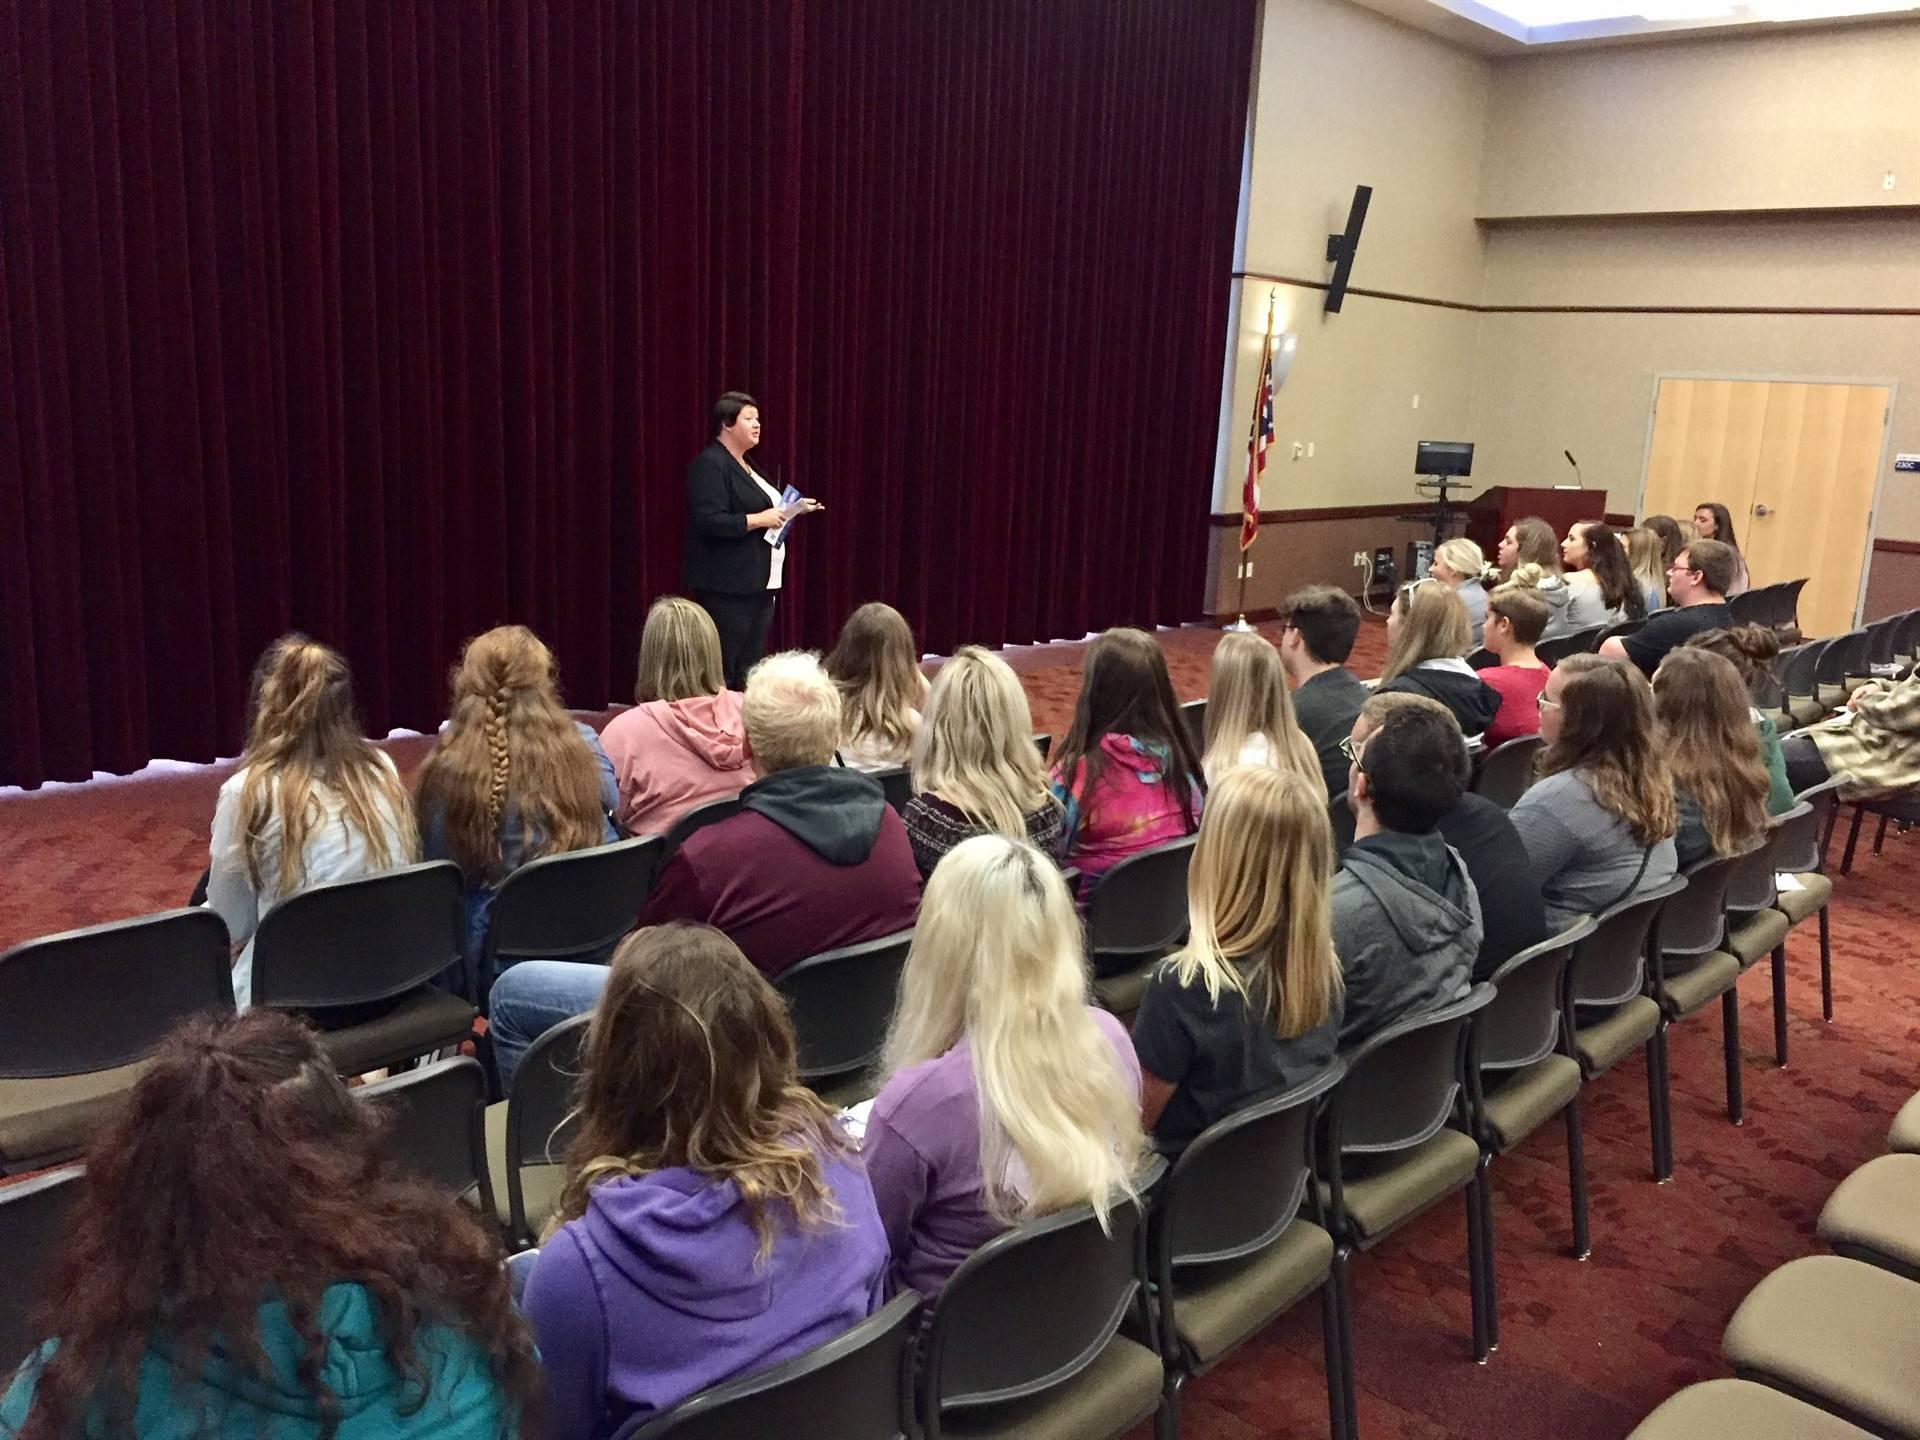 College Visit to Shawnee State University